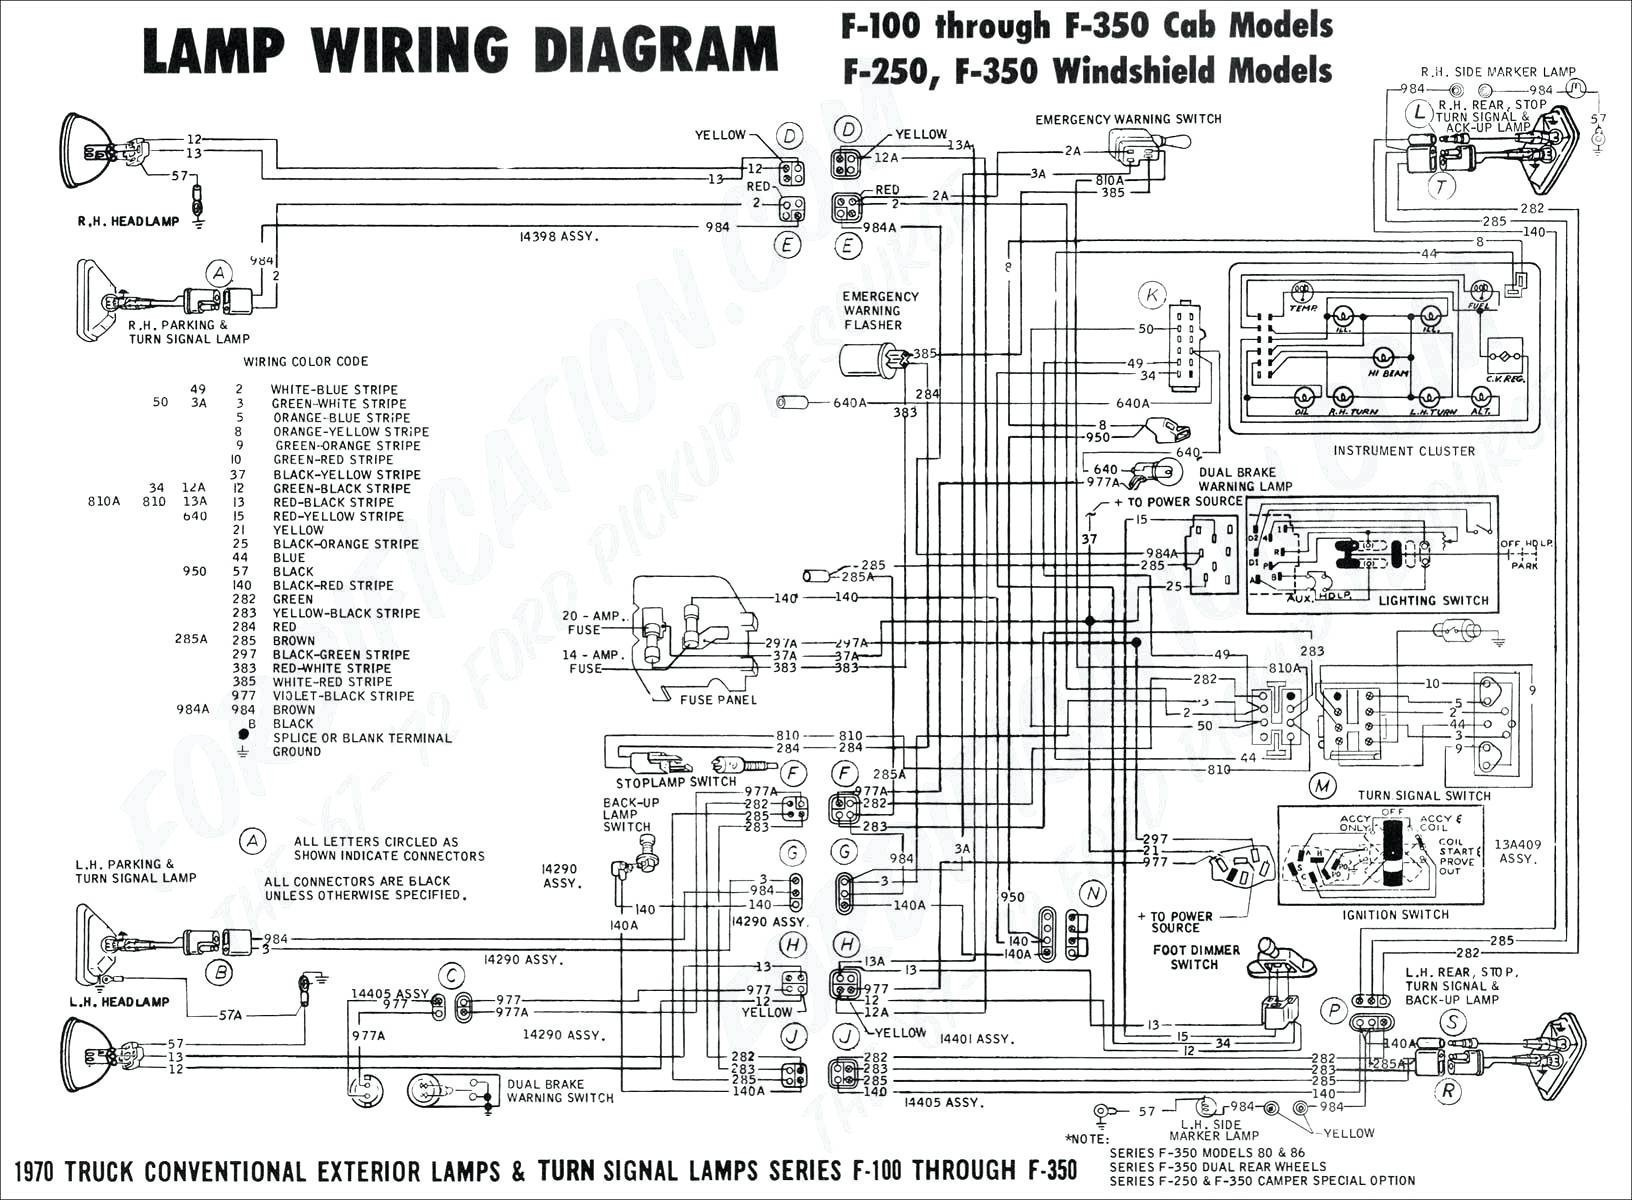 Ignition Switch Relay Wiring Diagram Fresh Polaris Starter solenoid Wiring Diagram Best Wire Diagram ford